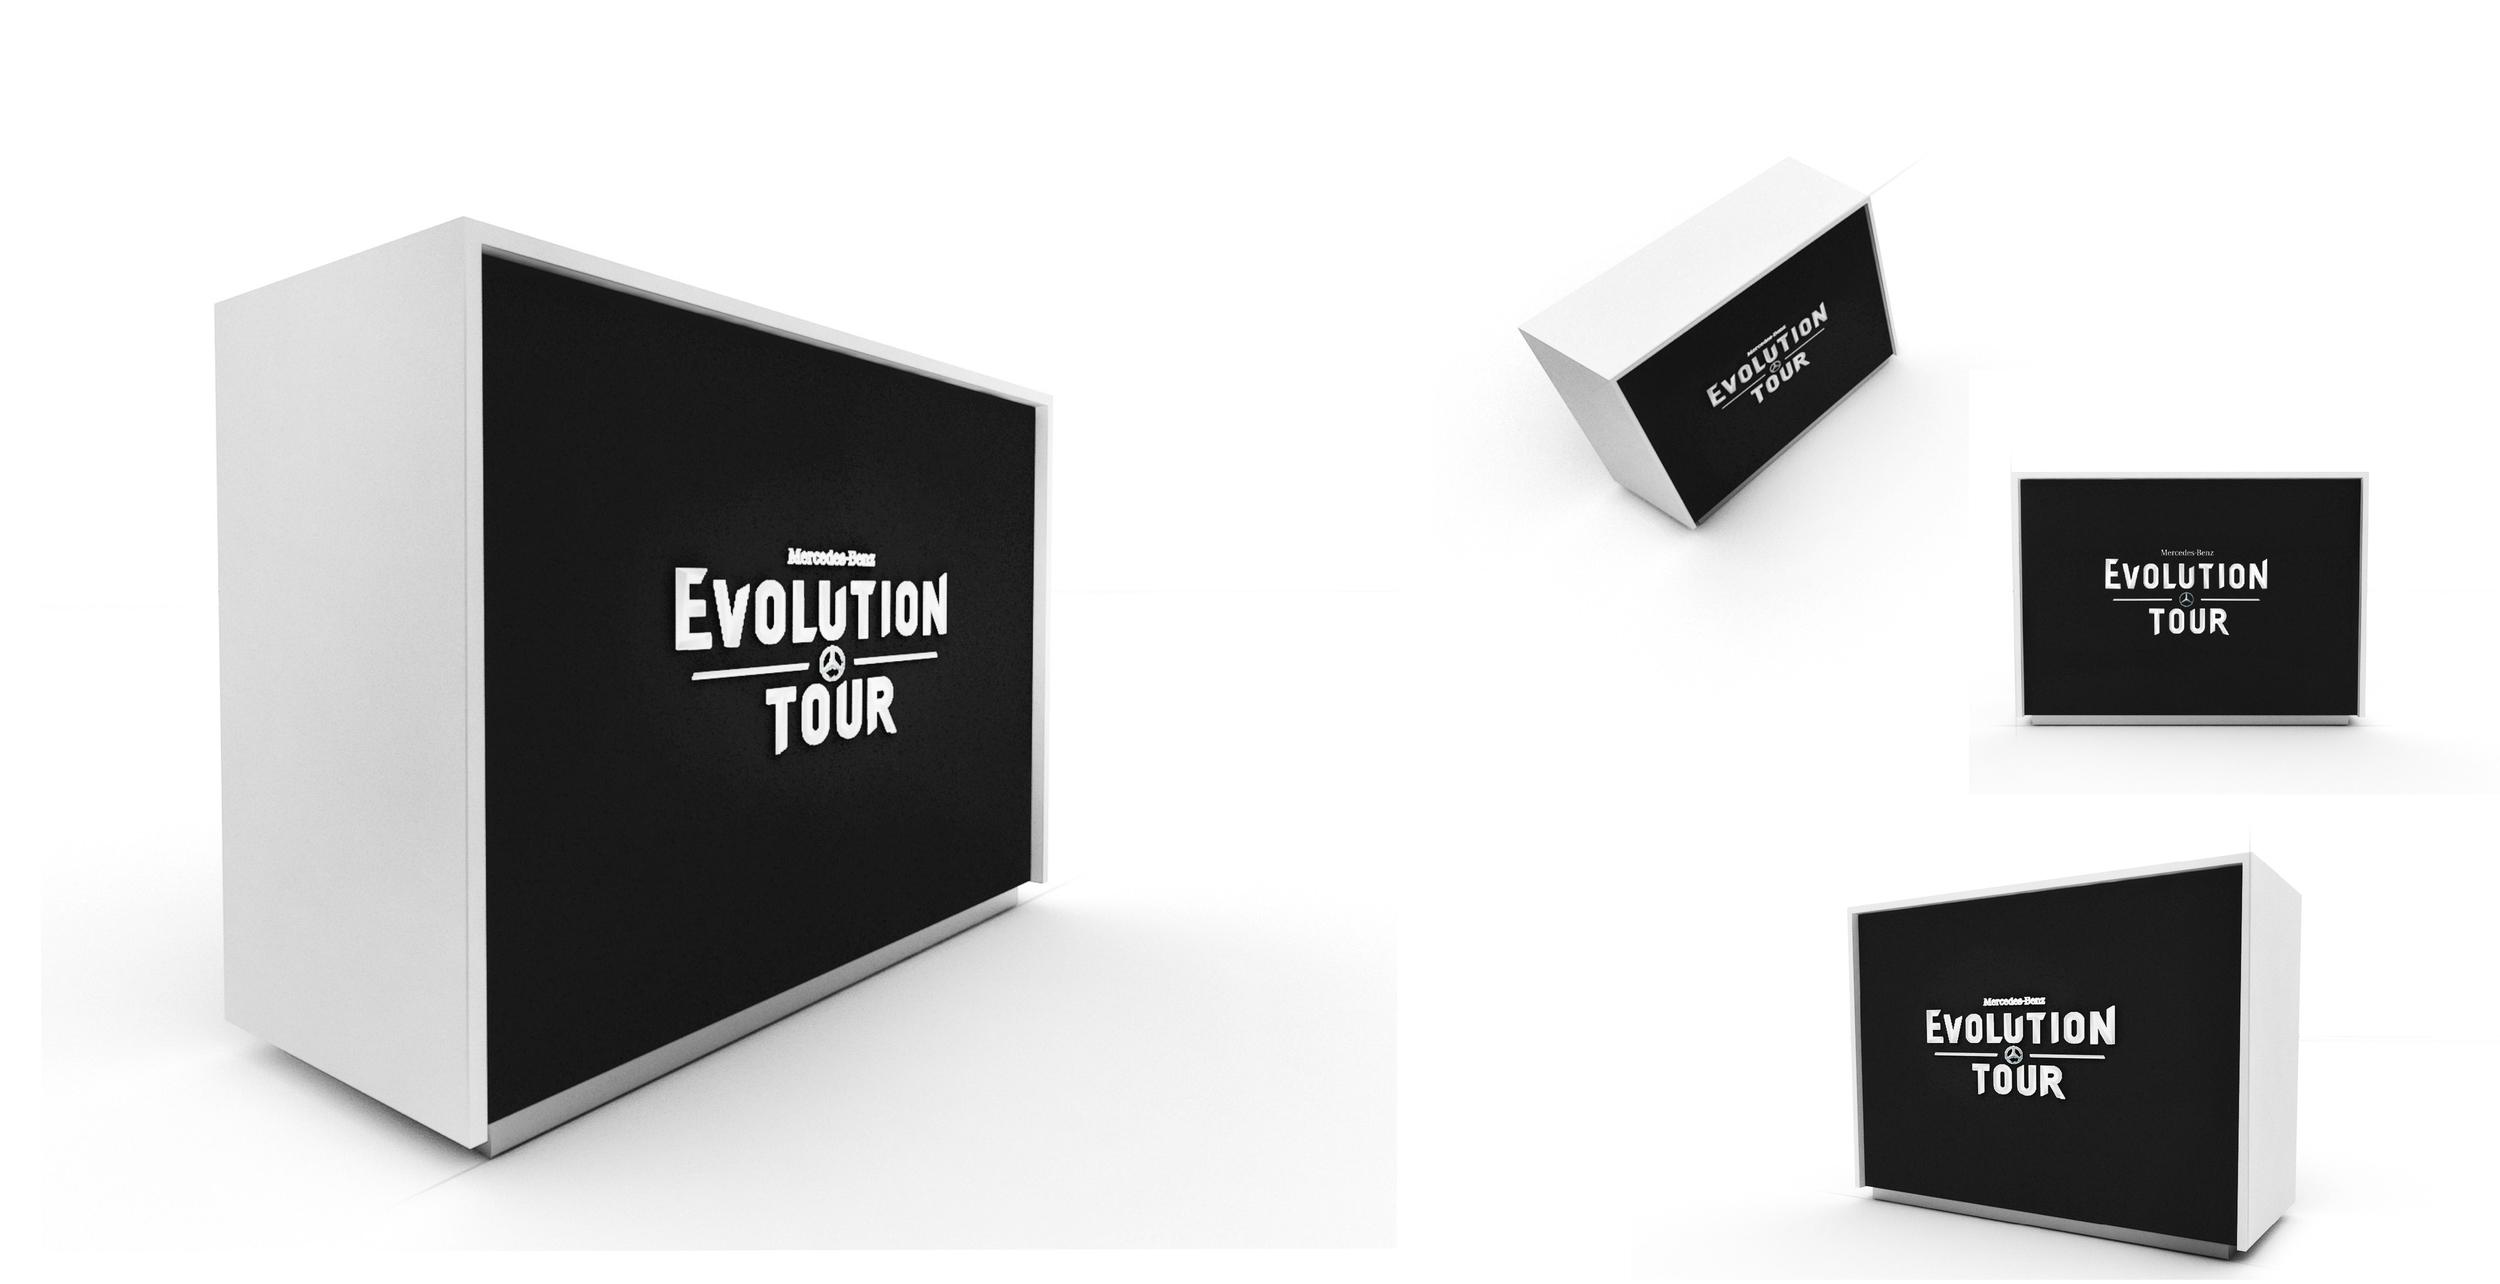 MB_EvolutionTour_03_26_15-21.jpg